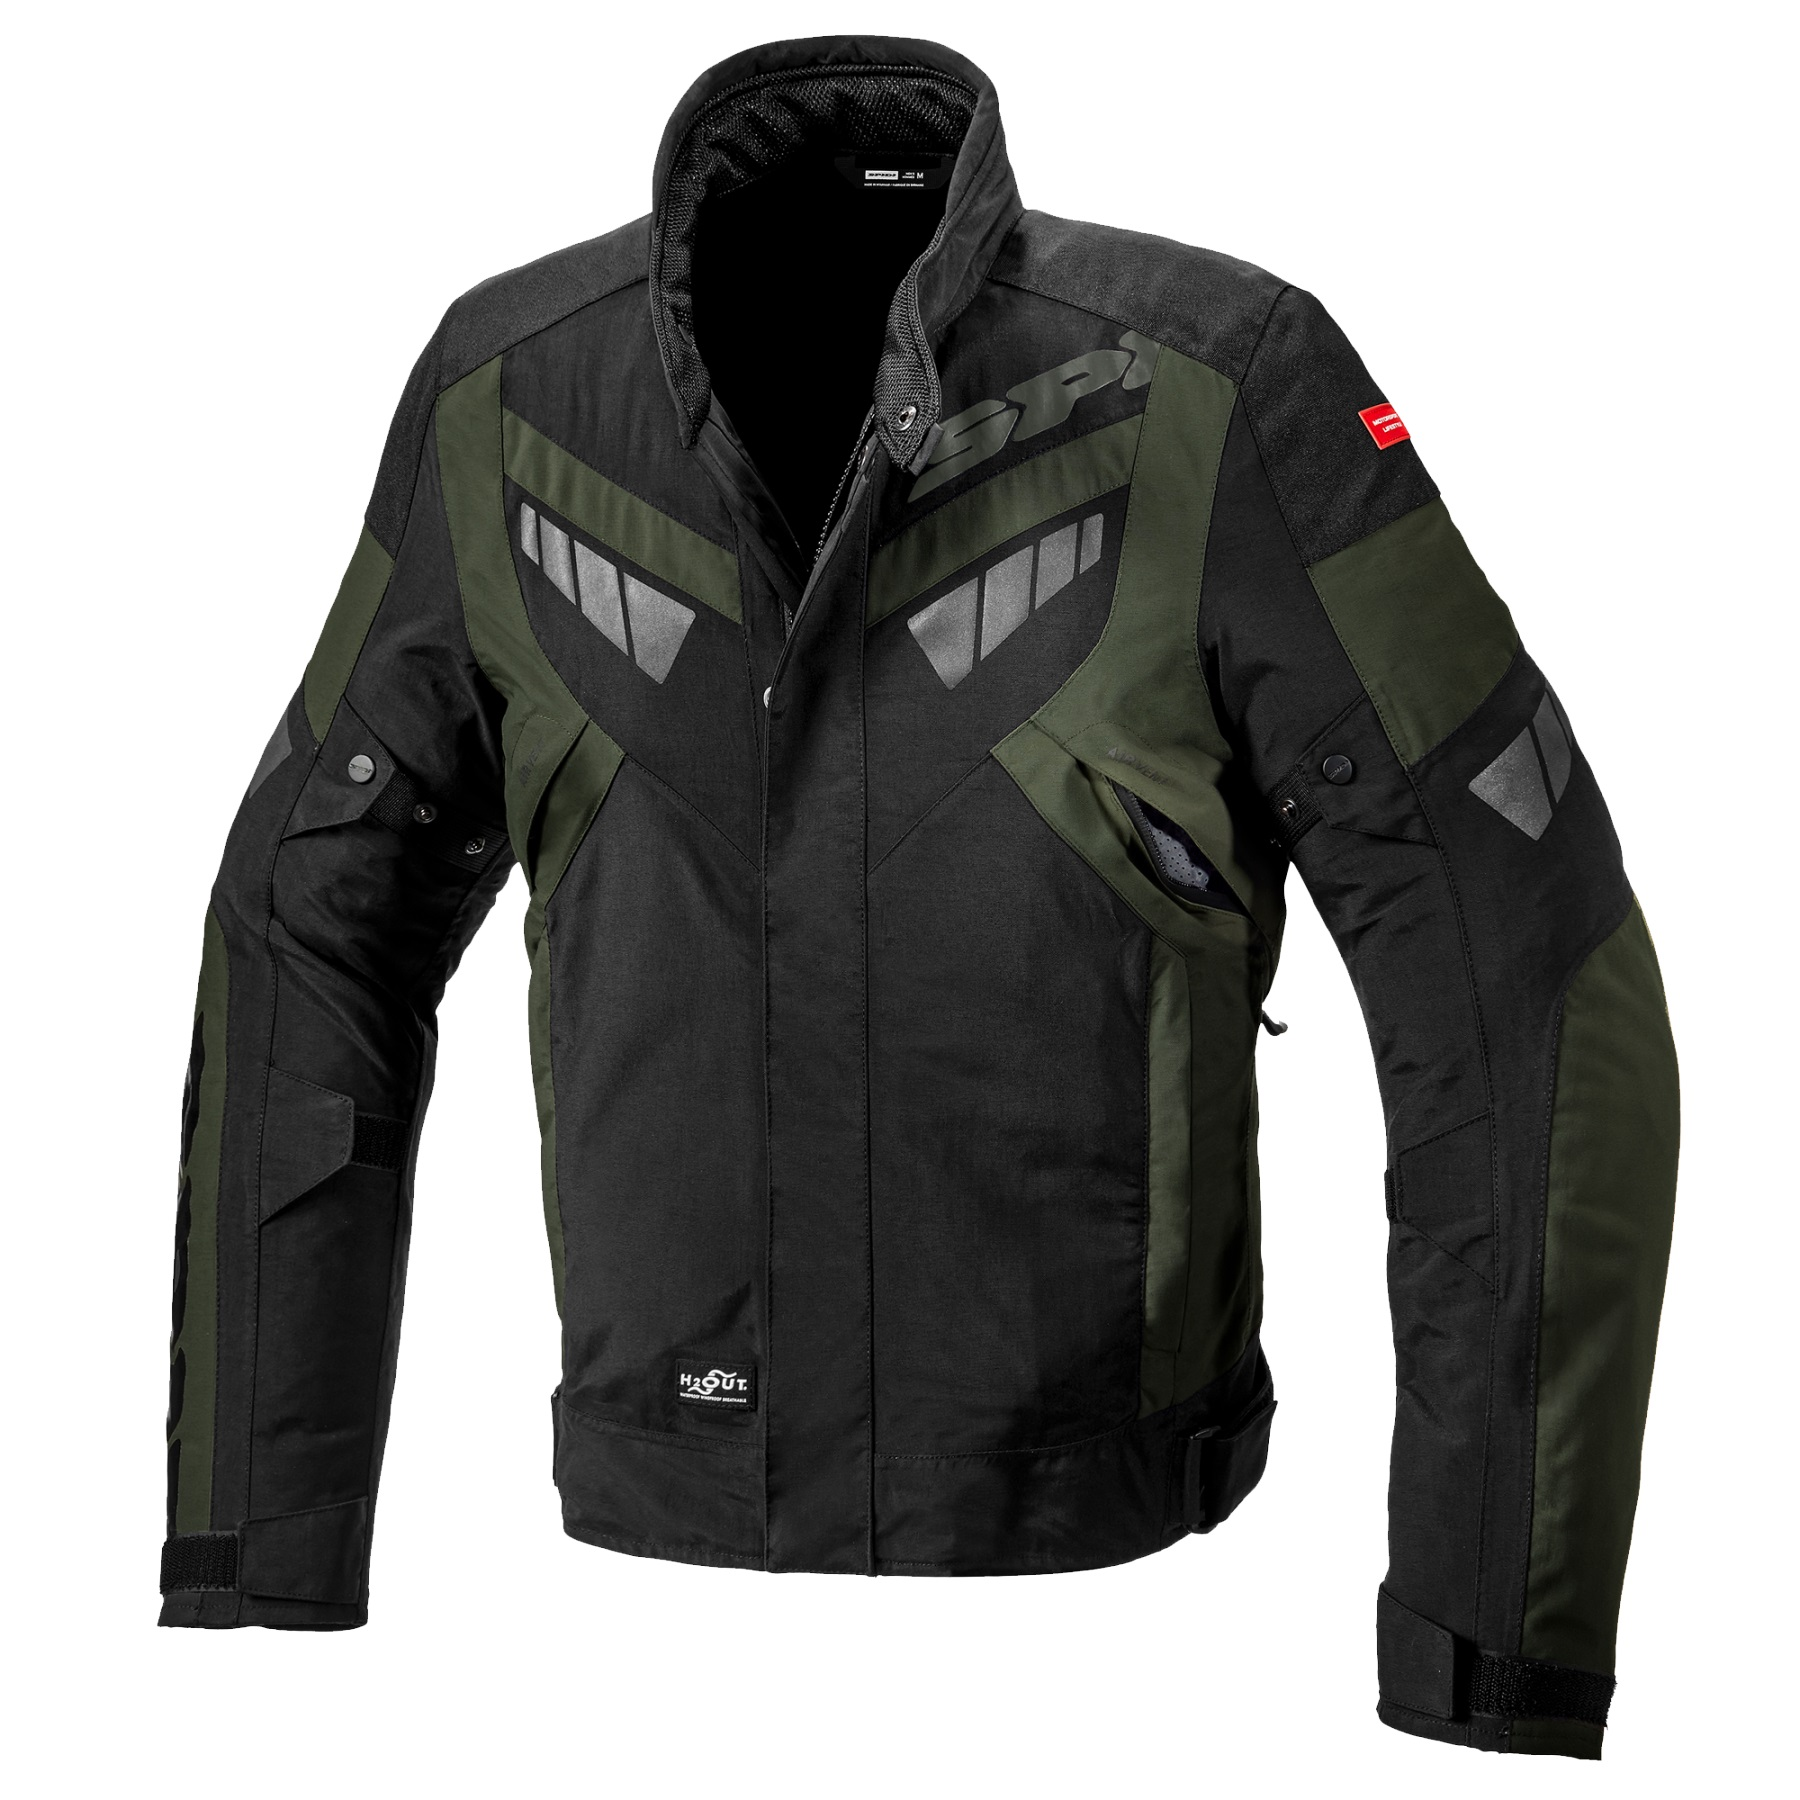 Spidi Freerider Dark Green Black Motorcycle Jacket XL